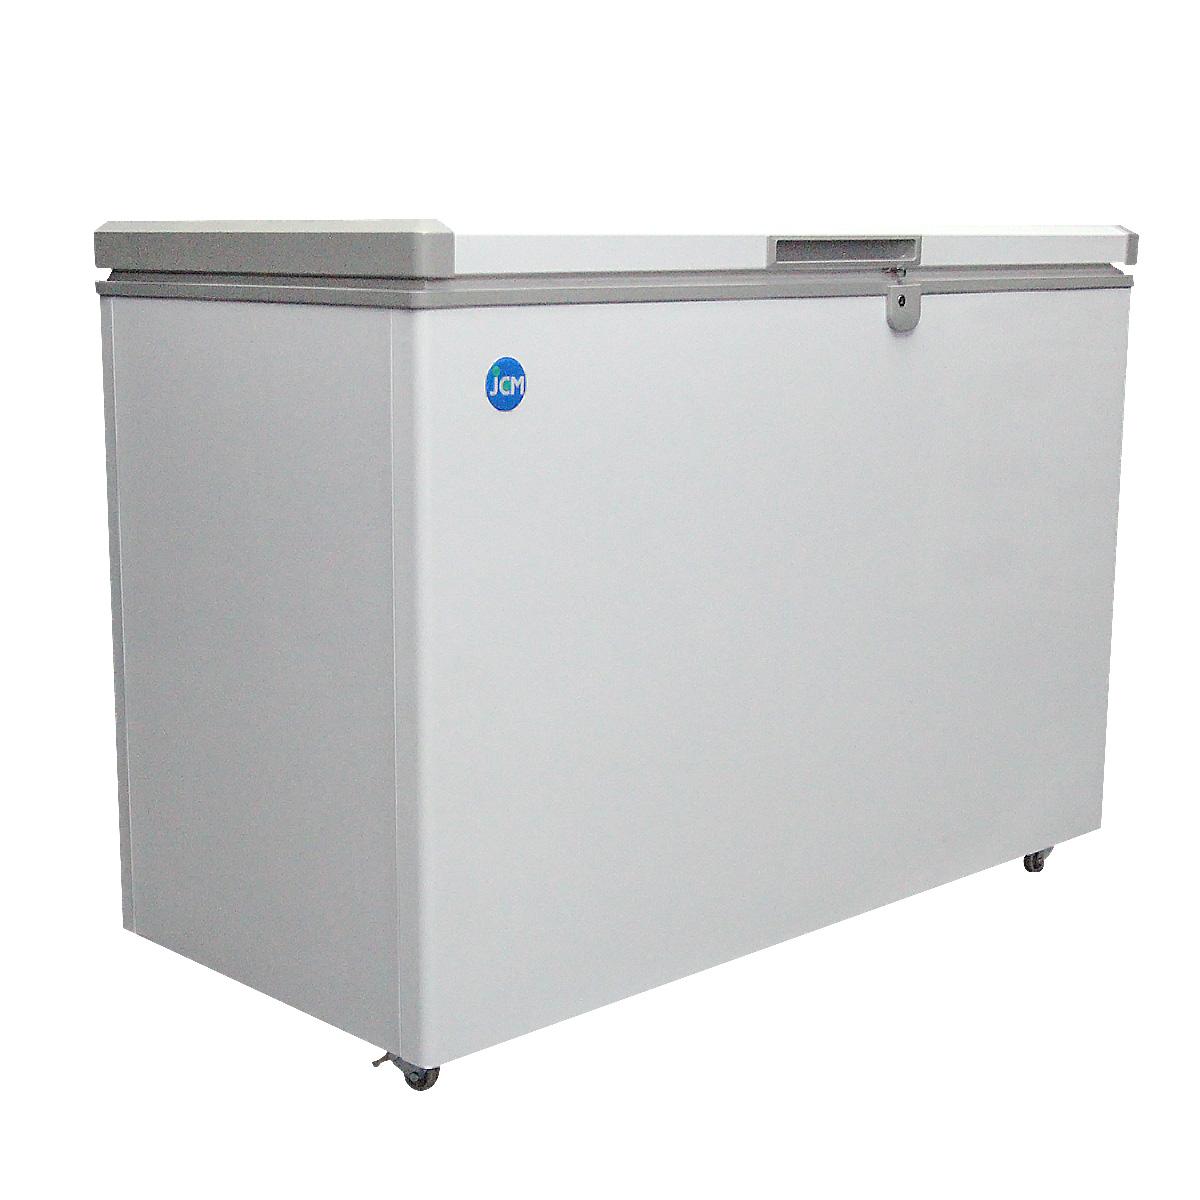 JCM 冷凍ストッカー 266L JCMC-266 業務用 冷凍庫 ストッカー 保冷庫 【代引不可】